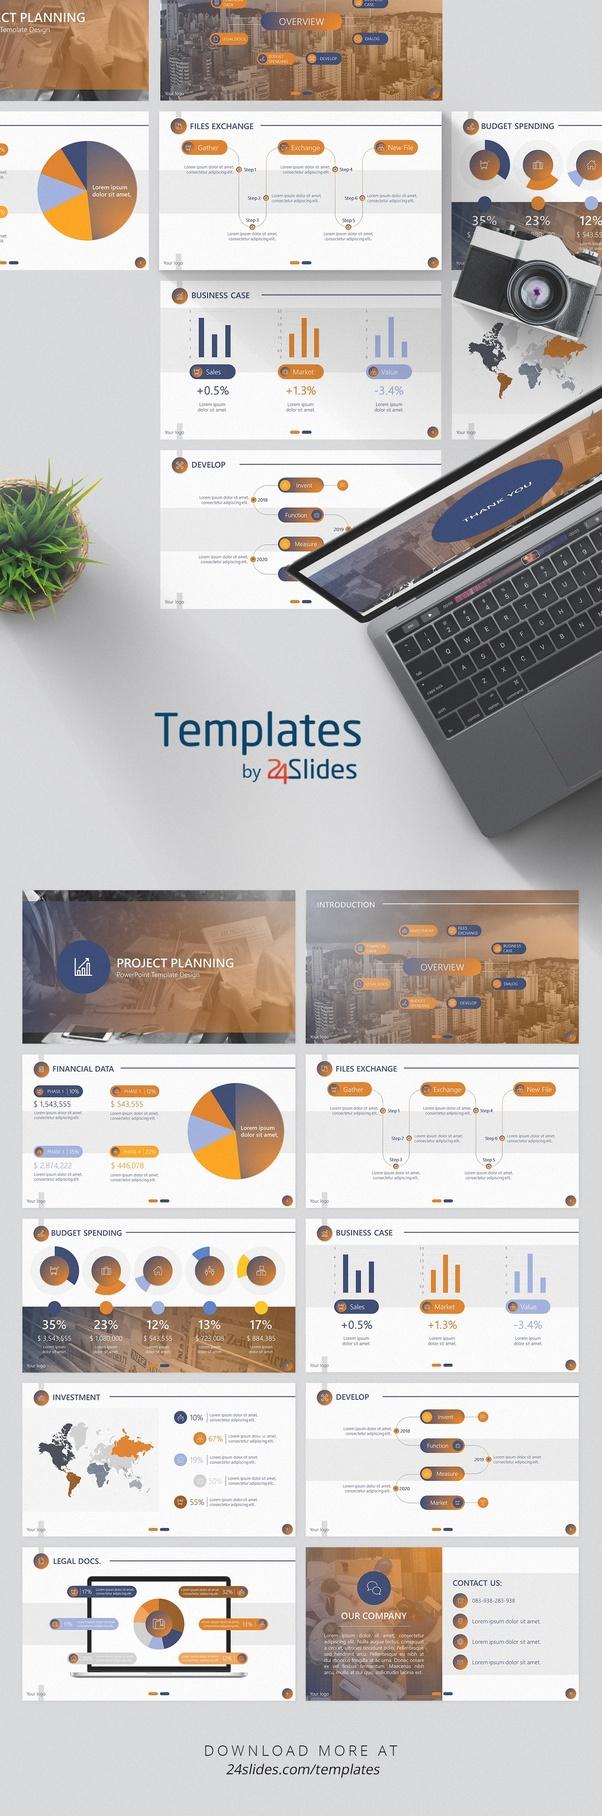 15 Best Google Slides Presentation Themes Premium Templates To The